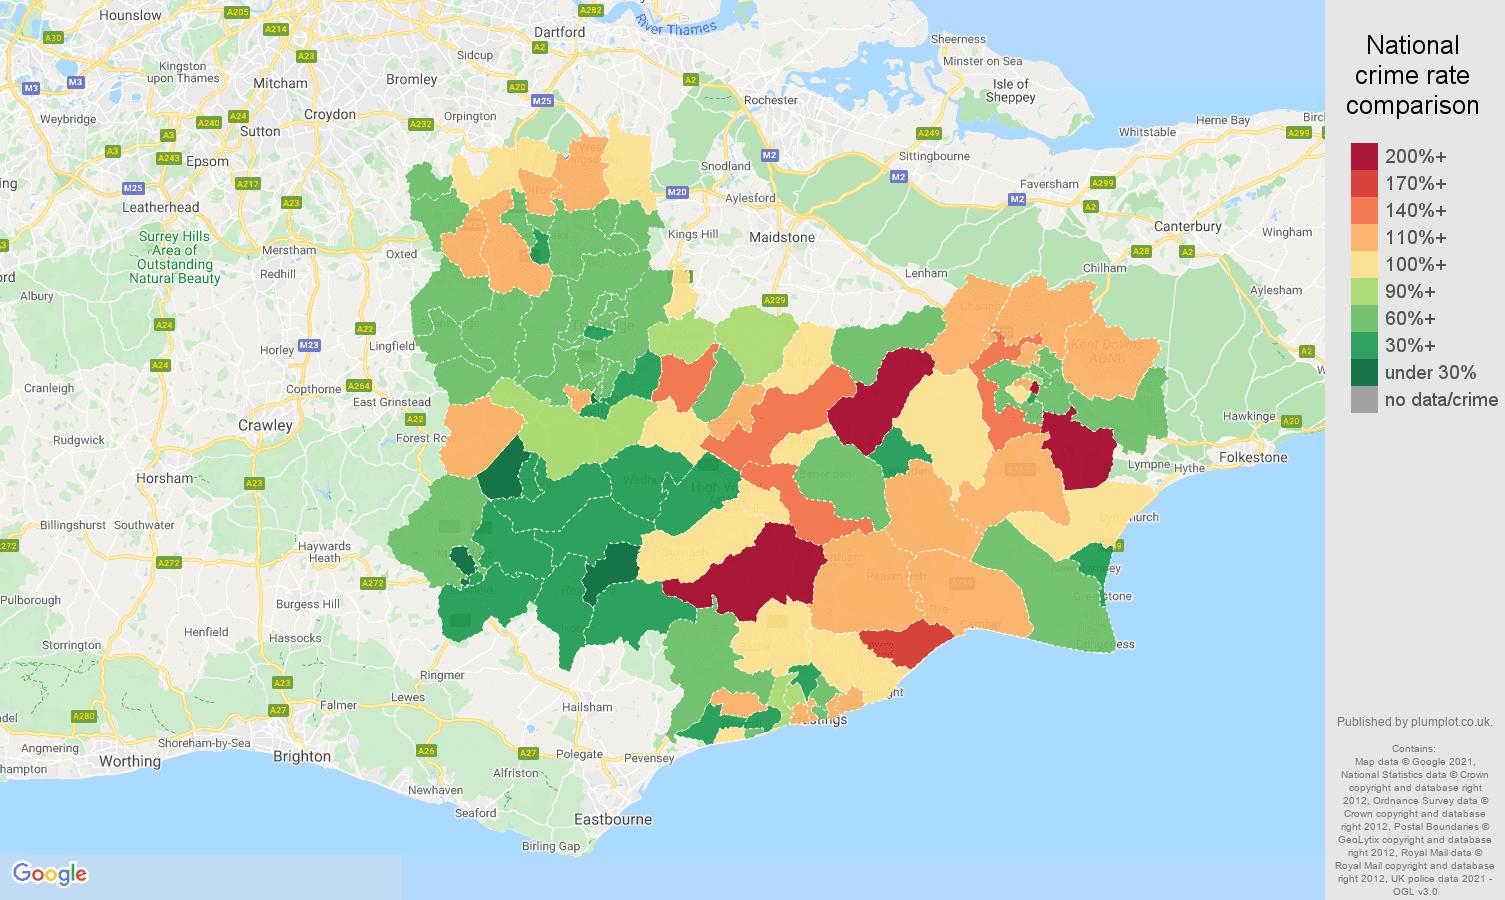 Tonbridge burglary crime rate comparison map